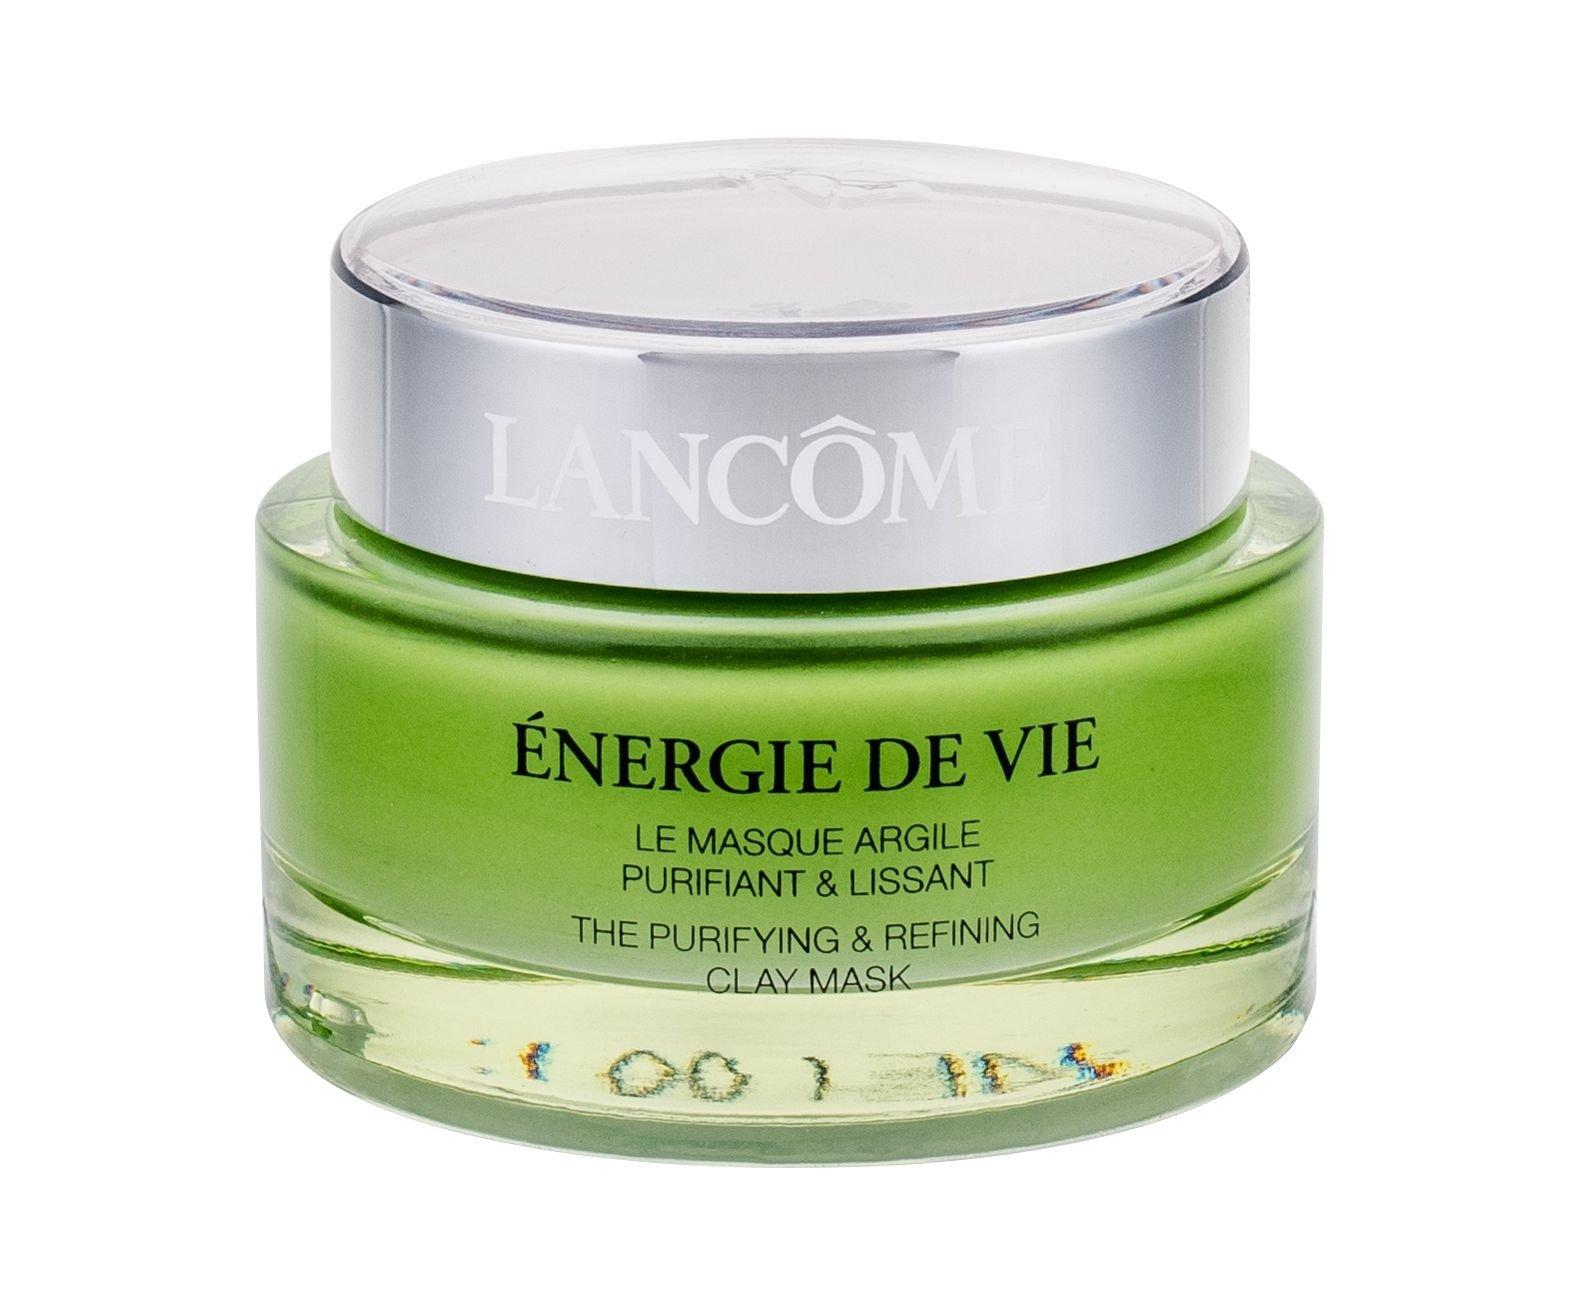 Lancôme Énergie De Vie Cosmetic 75ml  Clay Mask